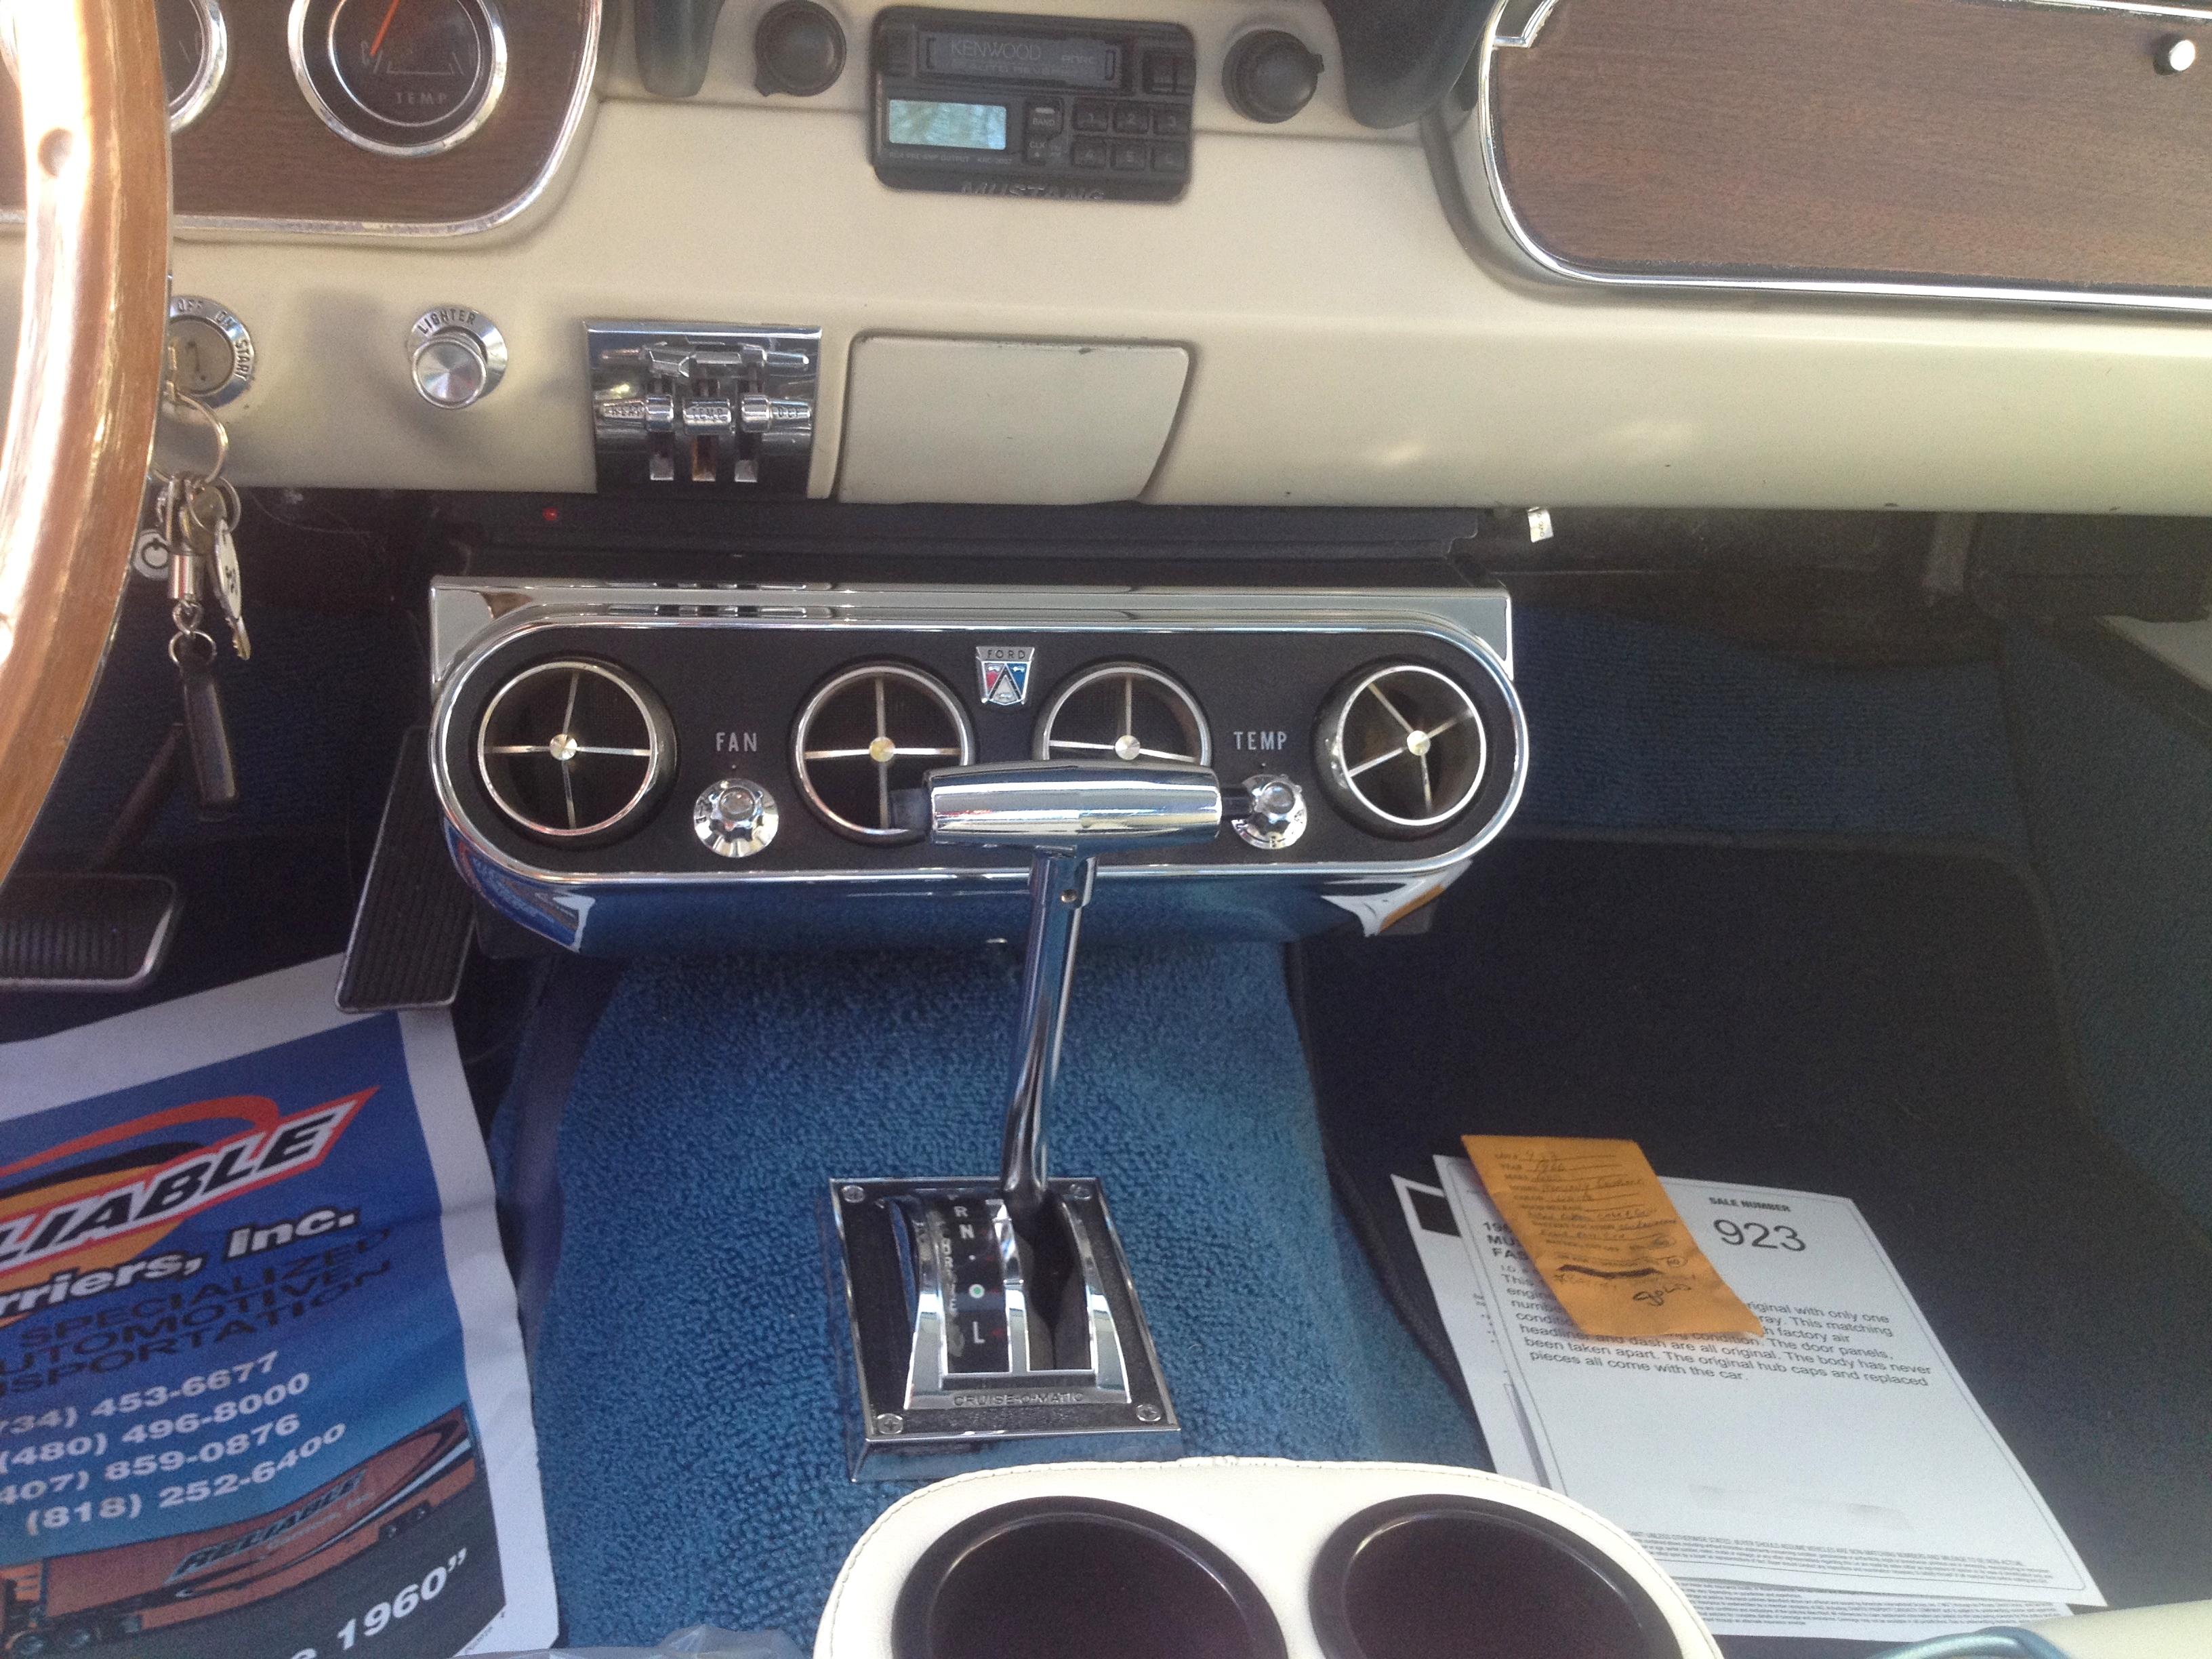 1966 ford mustang fastback - r&a motorsportsr&a motorsports